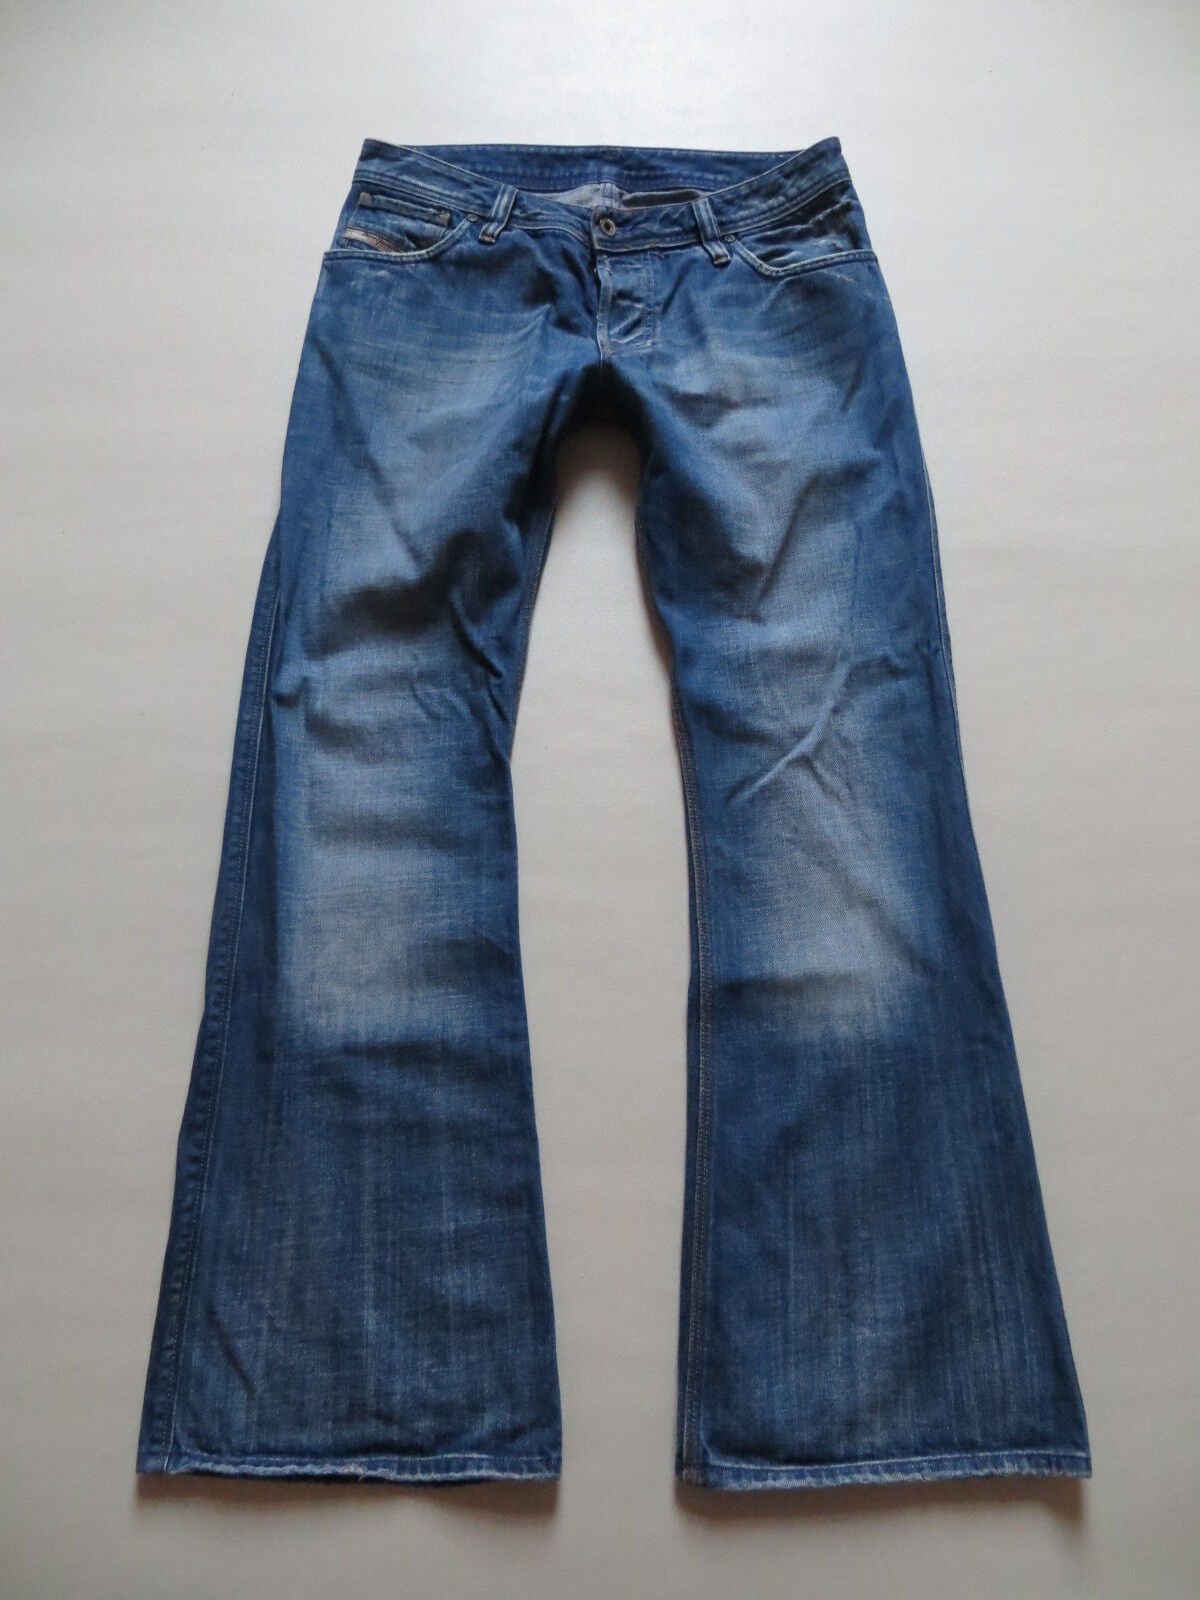 Diesel ZAF wash 00796 Schlag Jeans Hose, W 33  L 32, Vintage Denim, RARITÄT   50